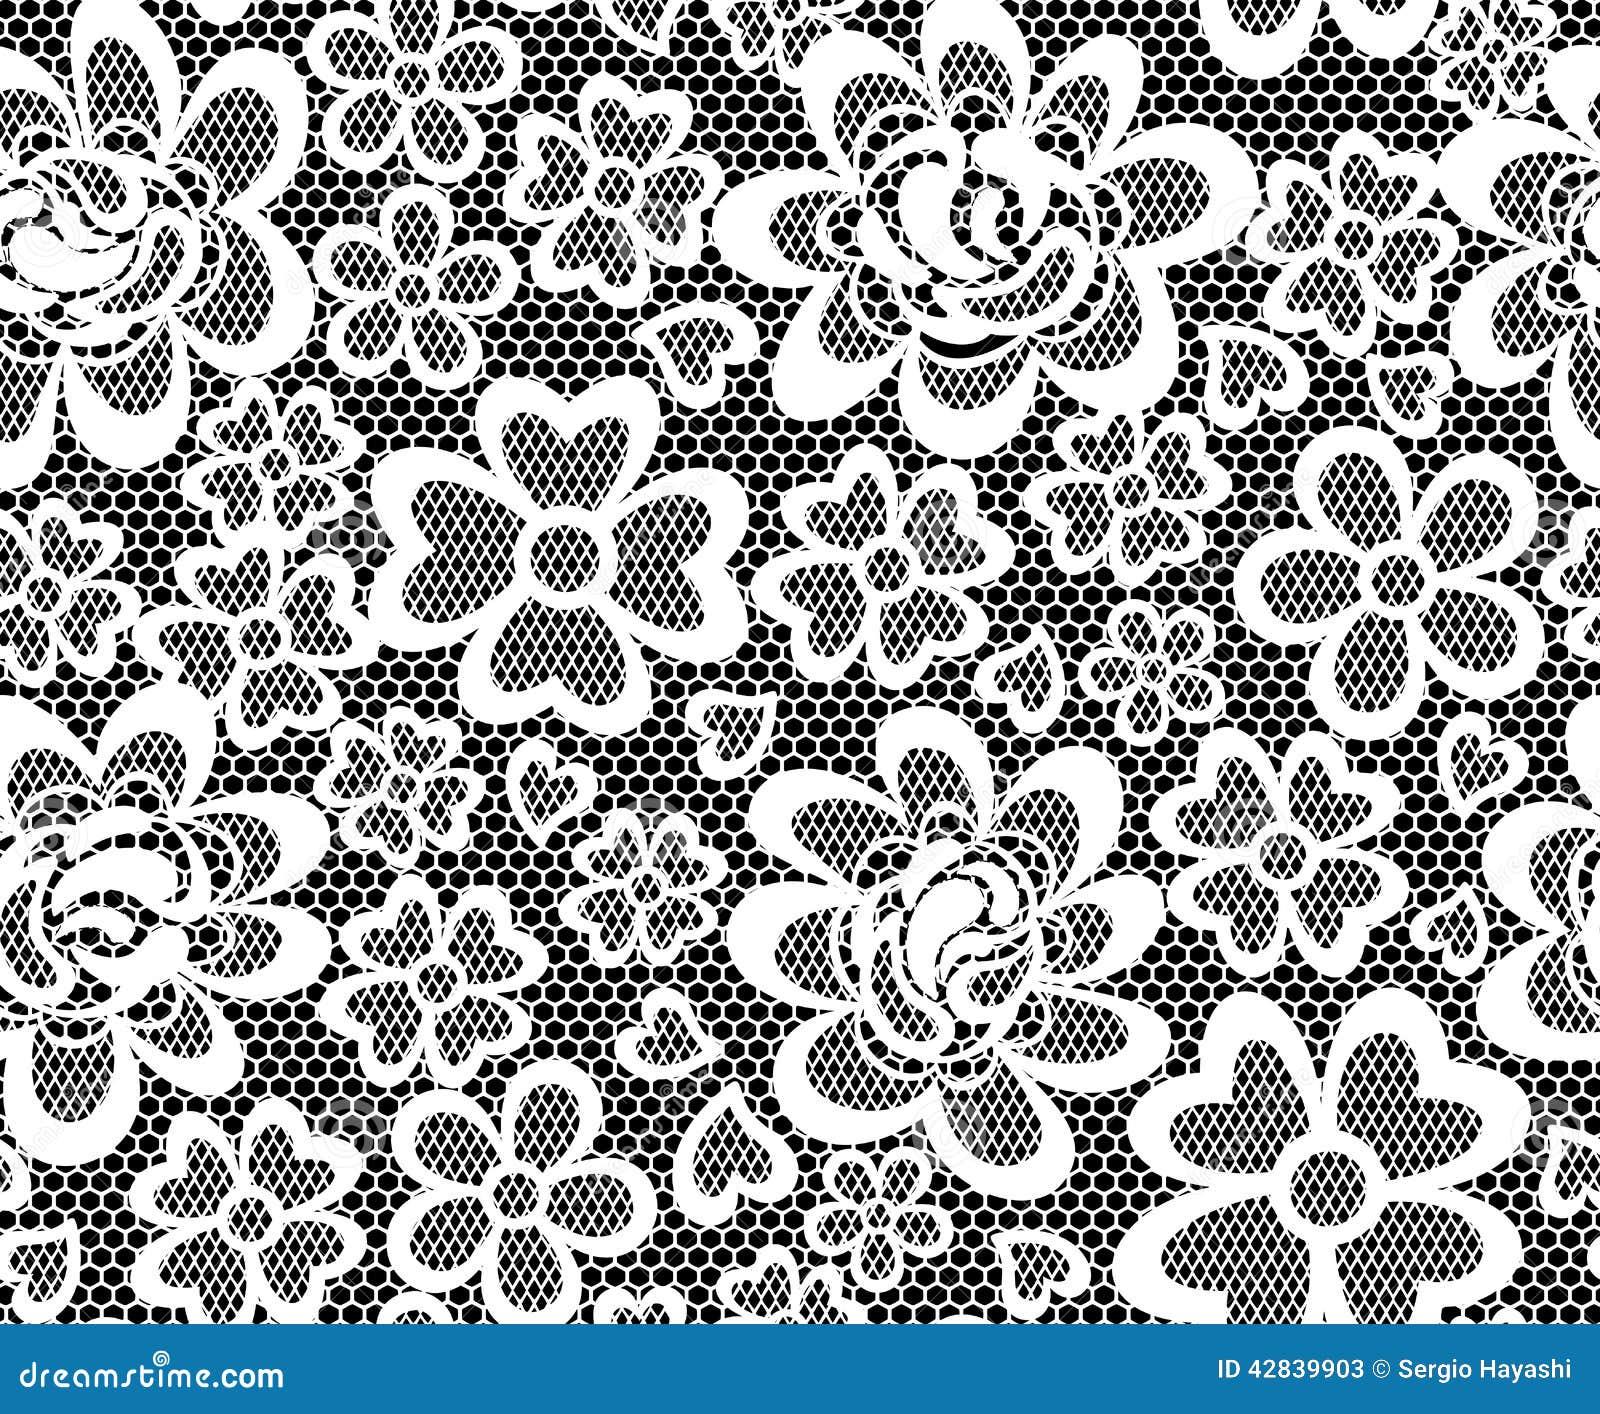 Großartig Muster Stickerei Ideen - Nähmuster-Ideen - sarasara.info